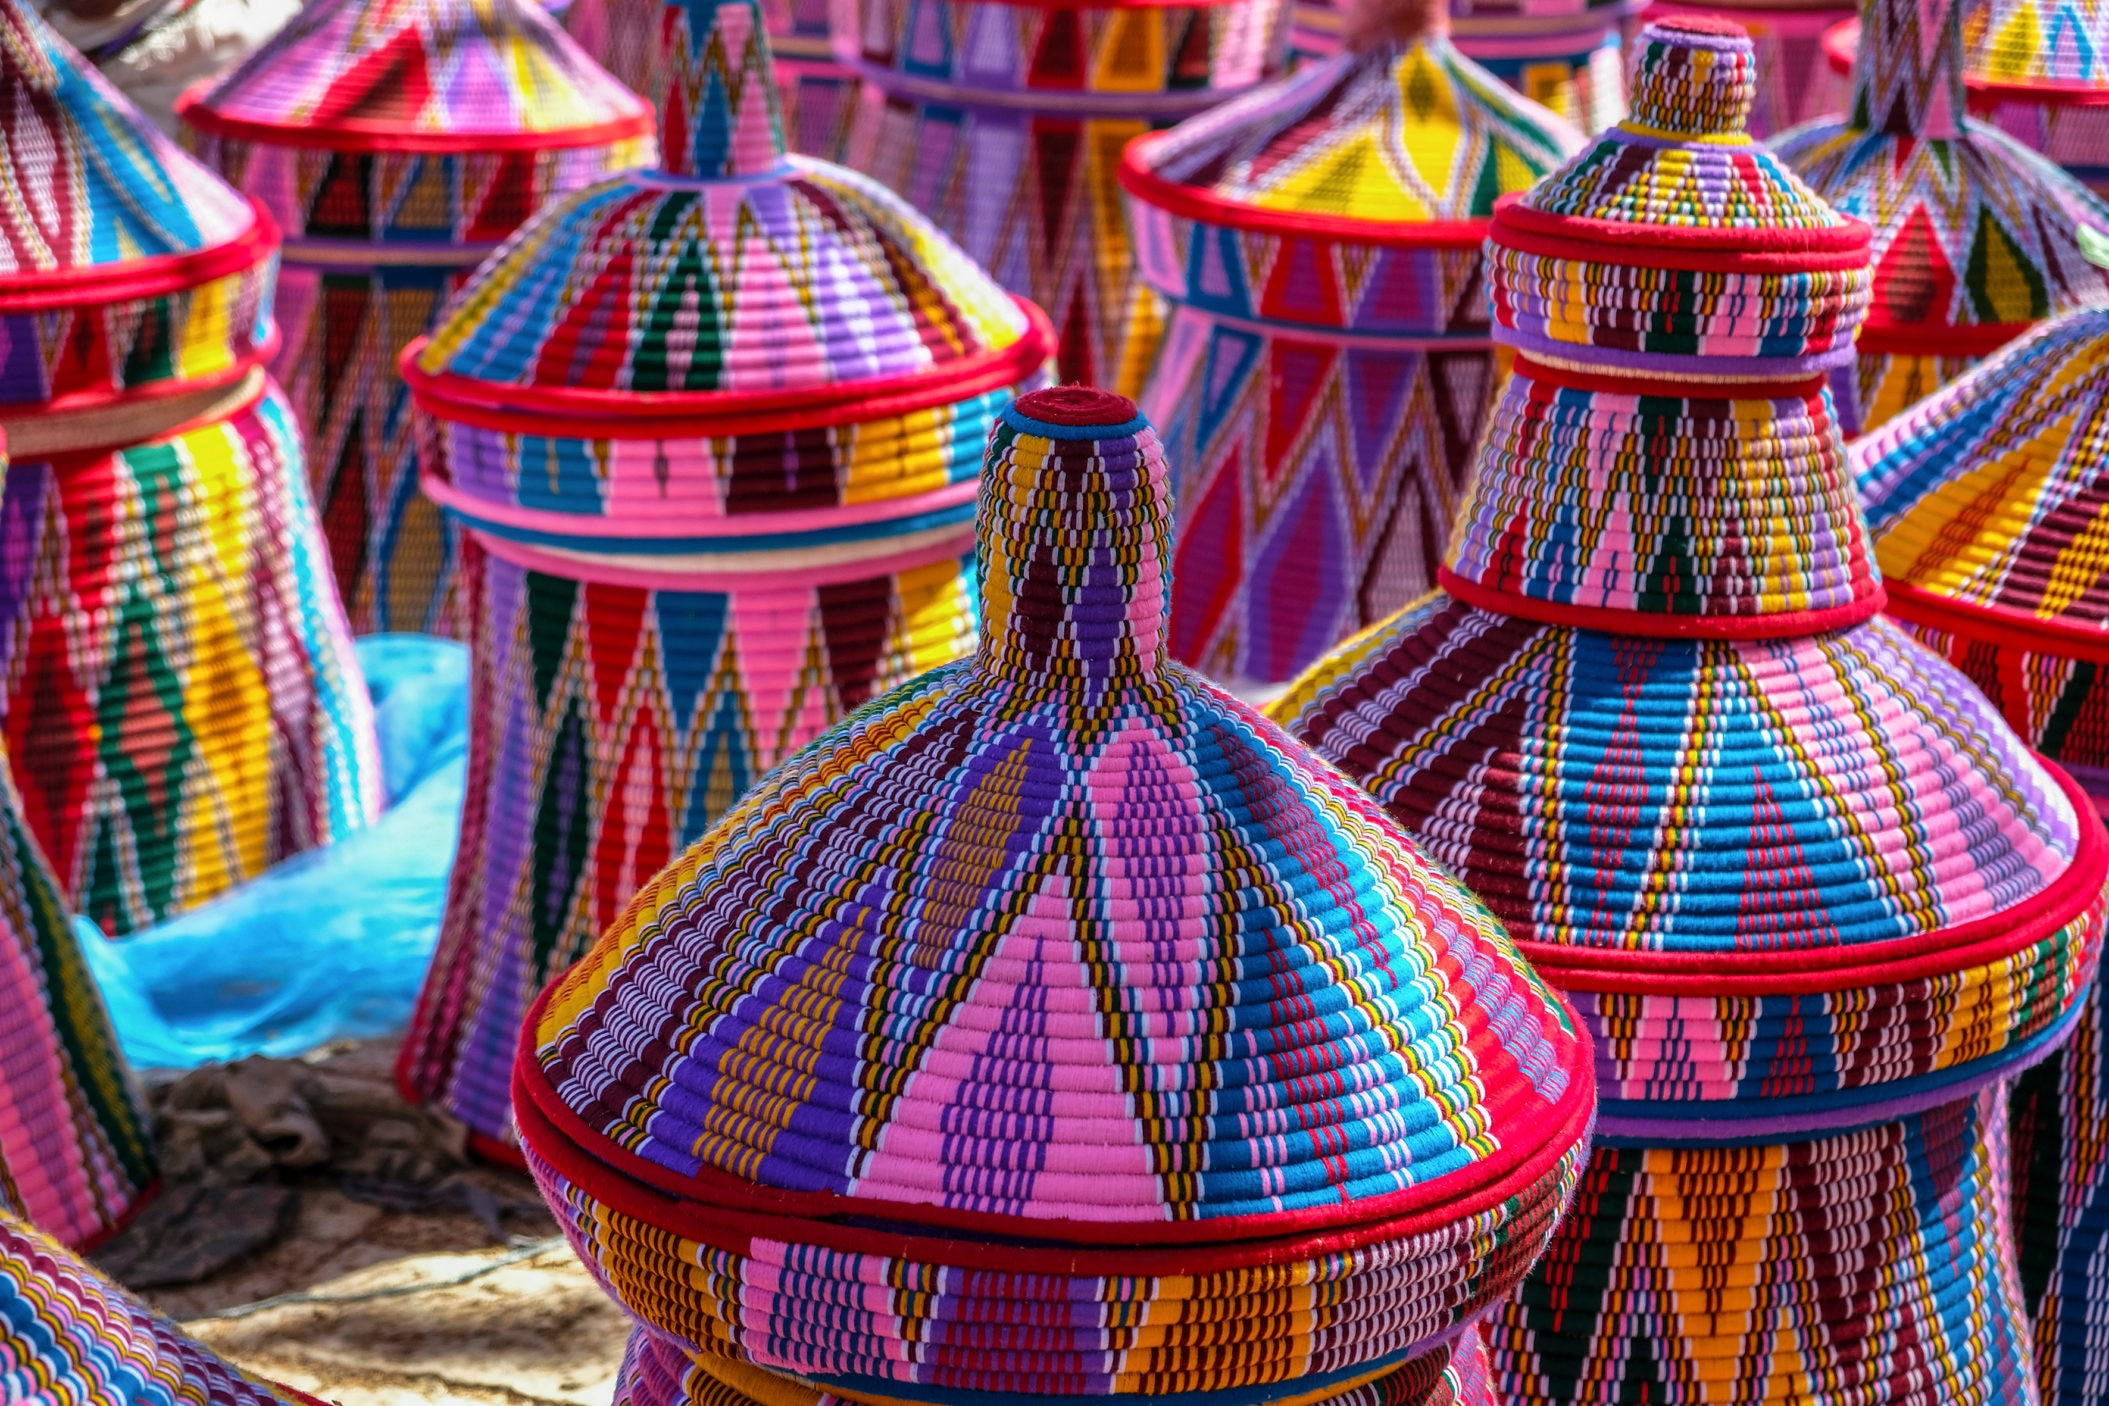 Ethiopia [shutterstock]